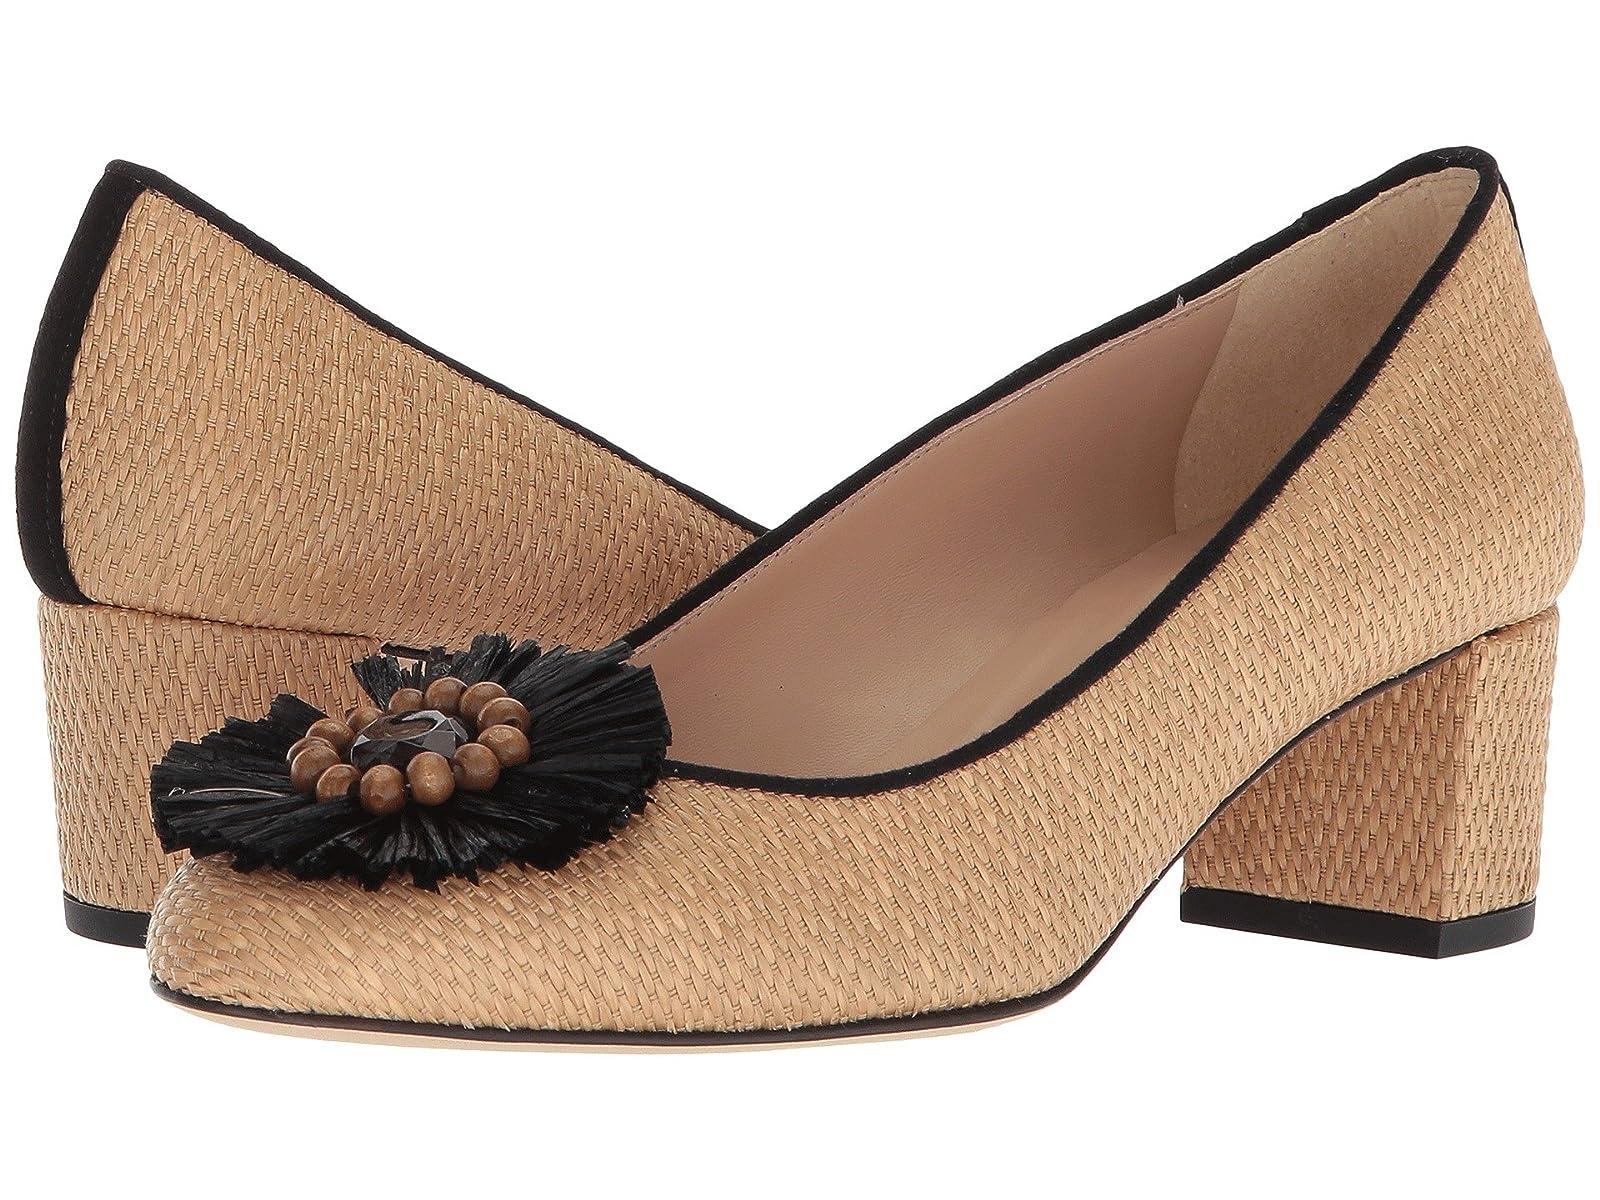 L.K. Bennett AbellaCheap and distinctive eye-catching shoes